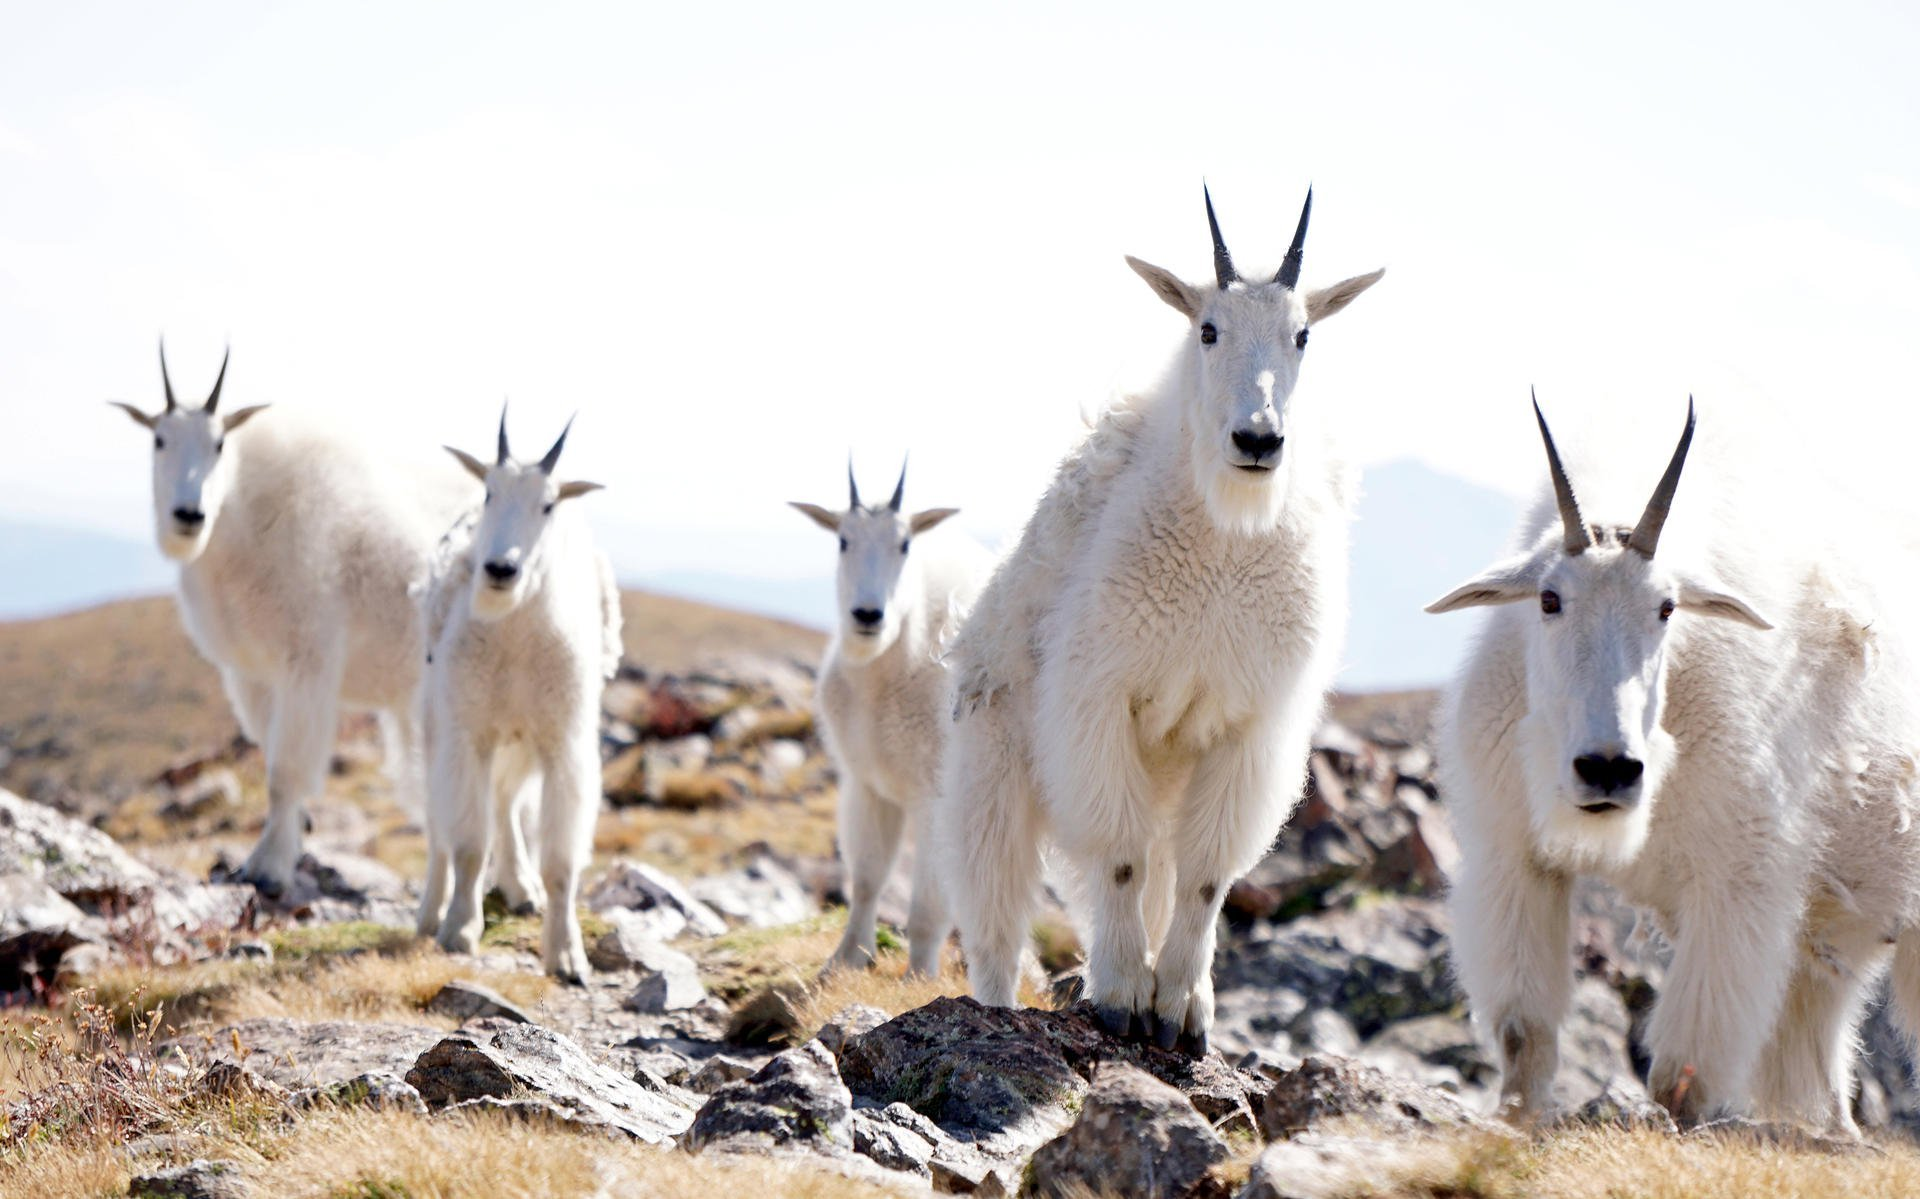 Resultado de imagen de goats hiking wear places